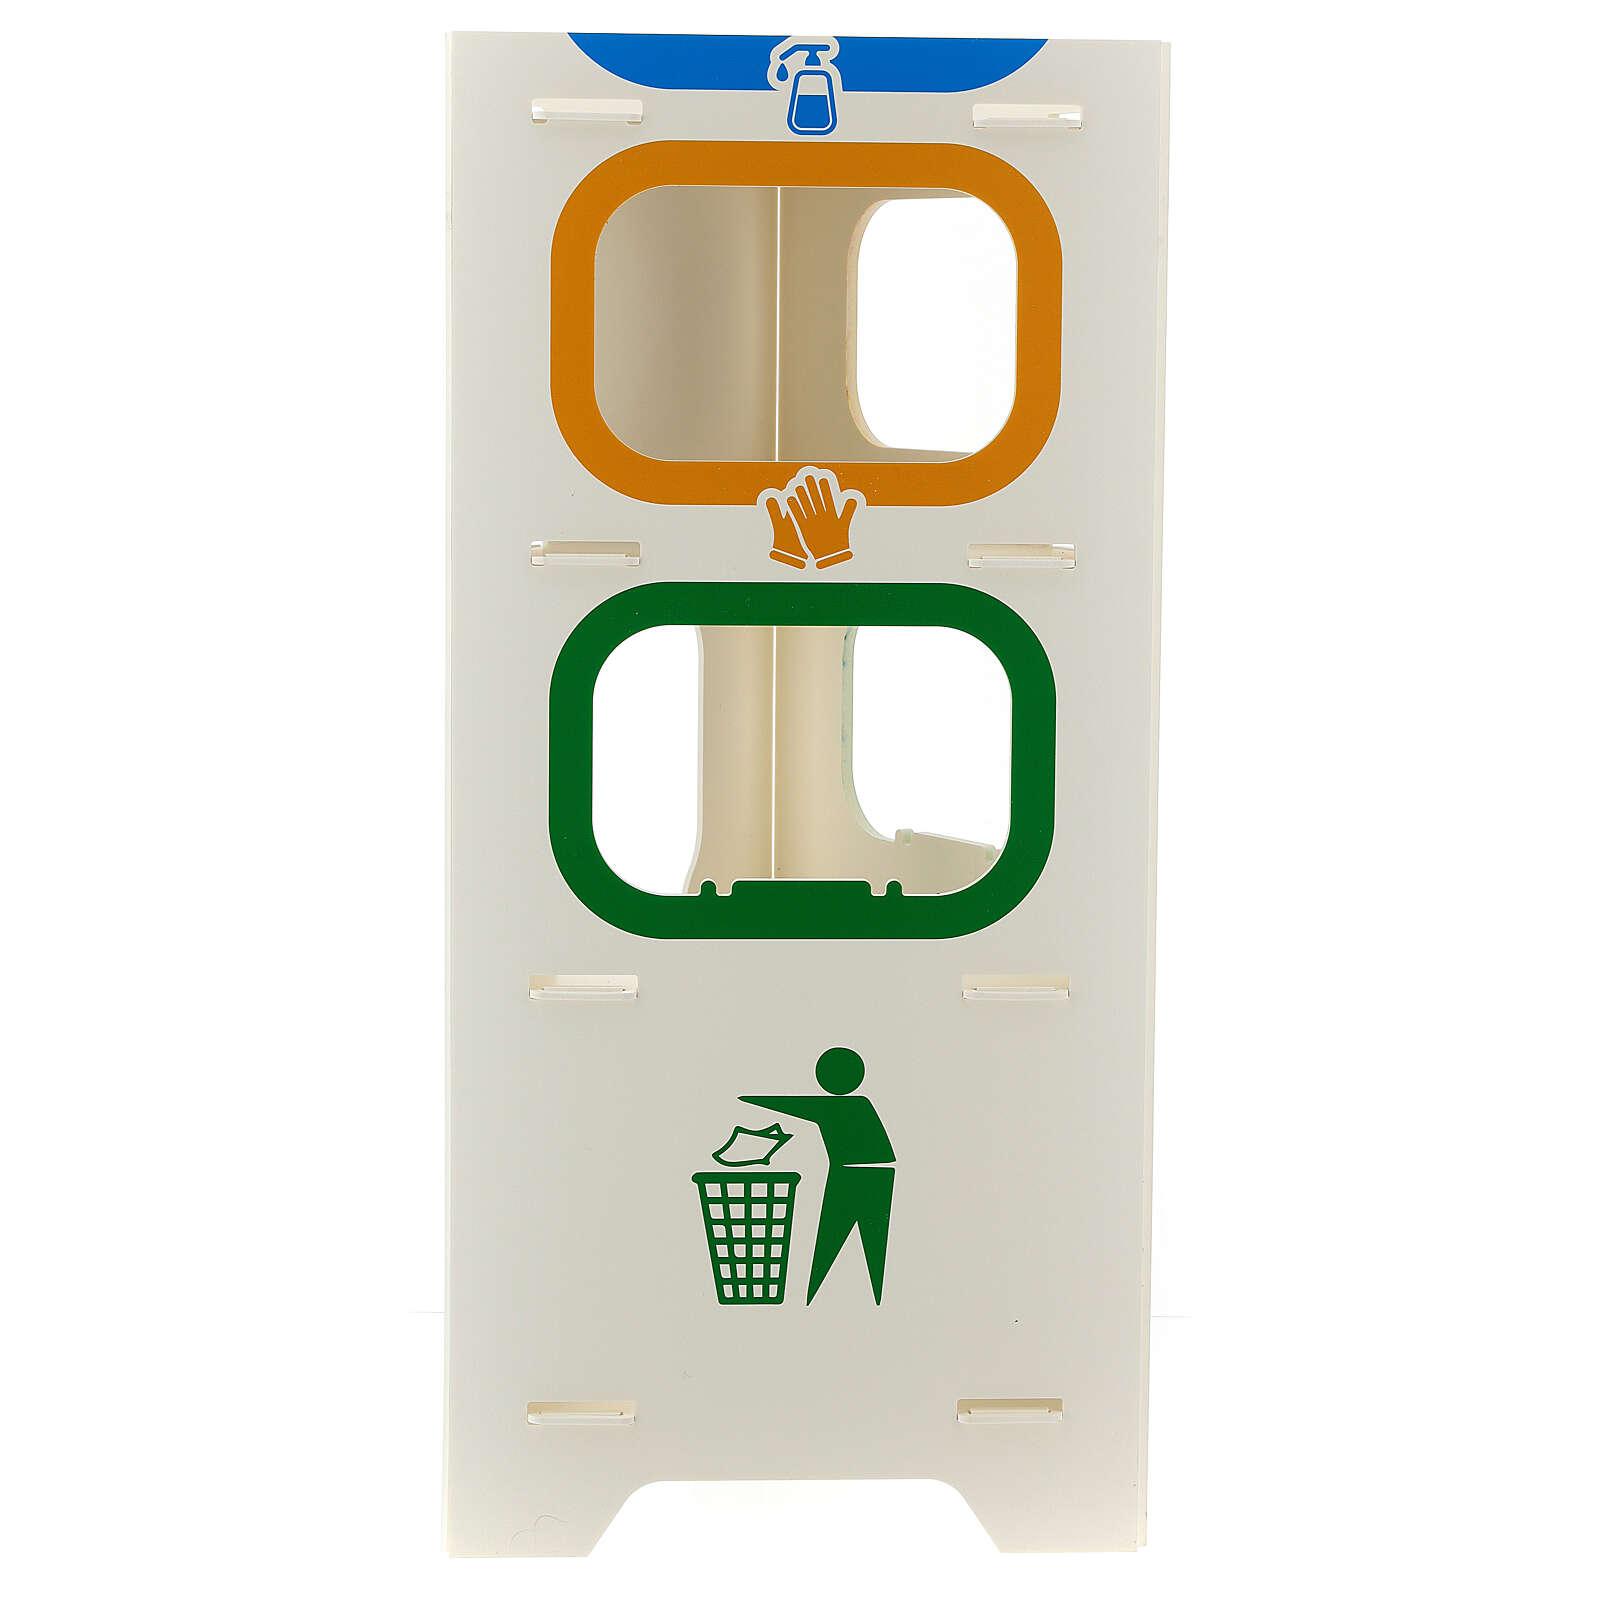 Totem porta dispenser gel igienizzante guanti e rifiuti 3